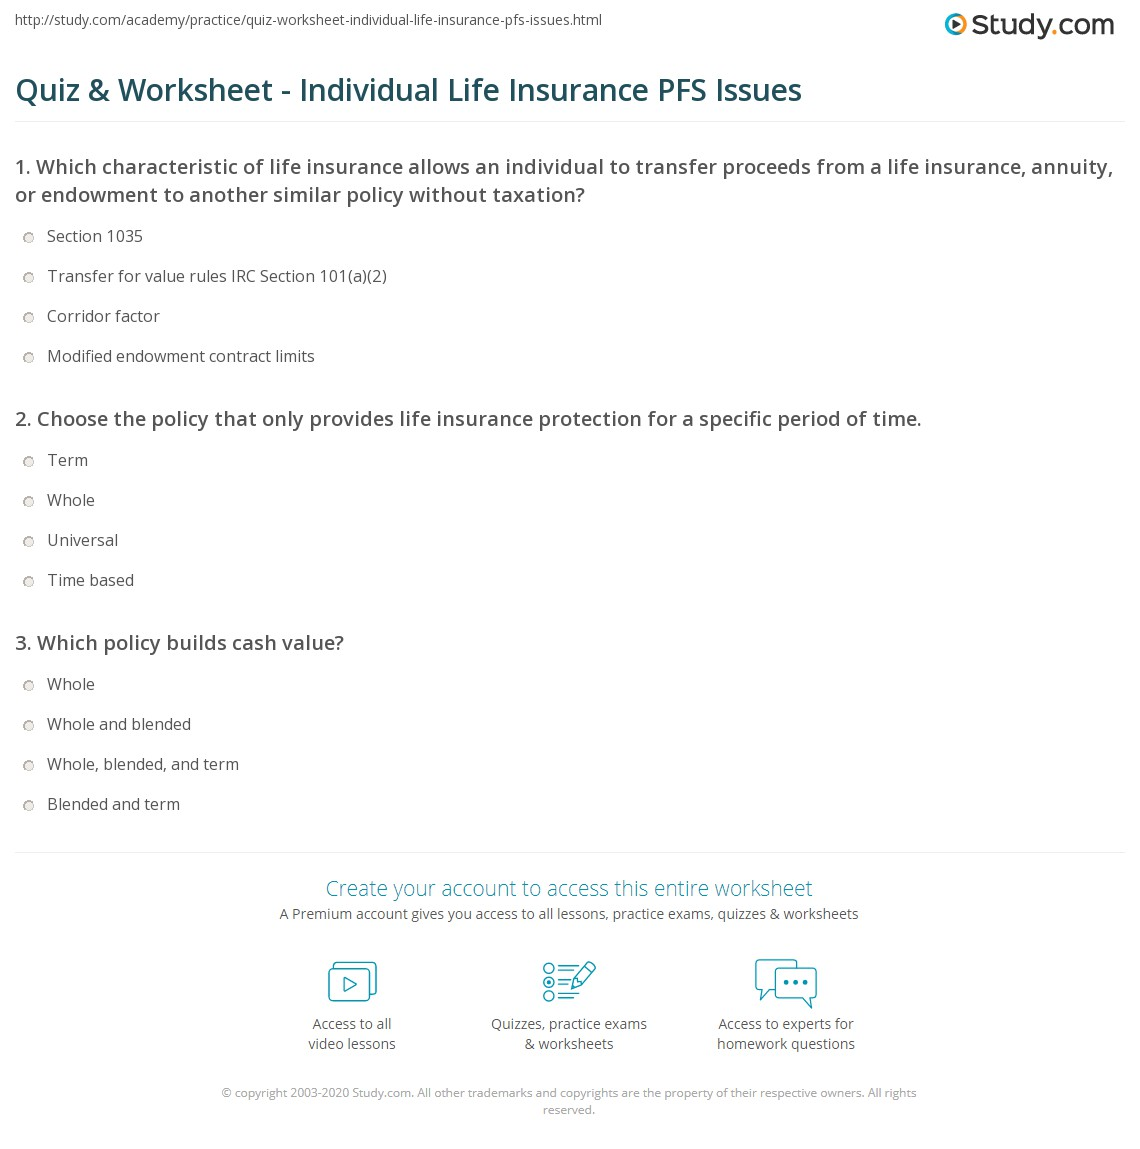 Quiz & Worksheet - Individual Life Insurance PFS Issues ...